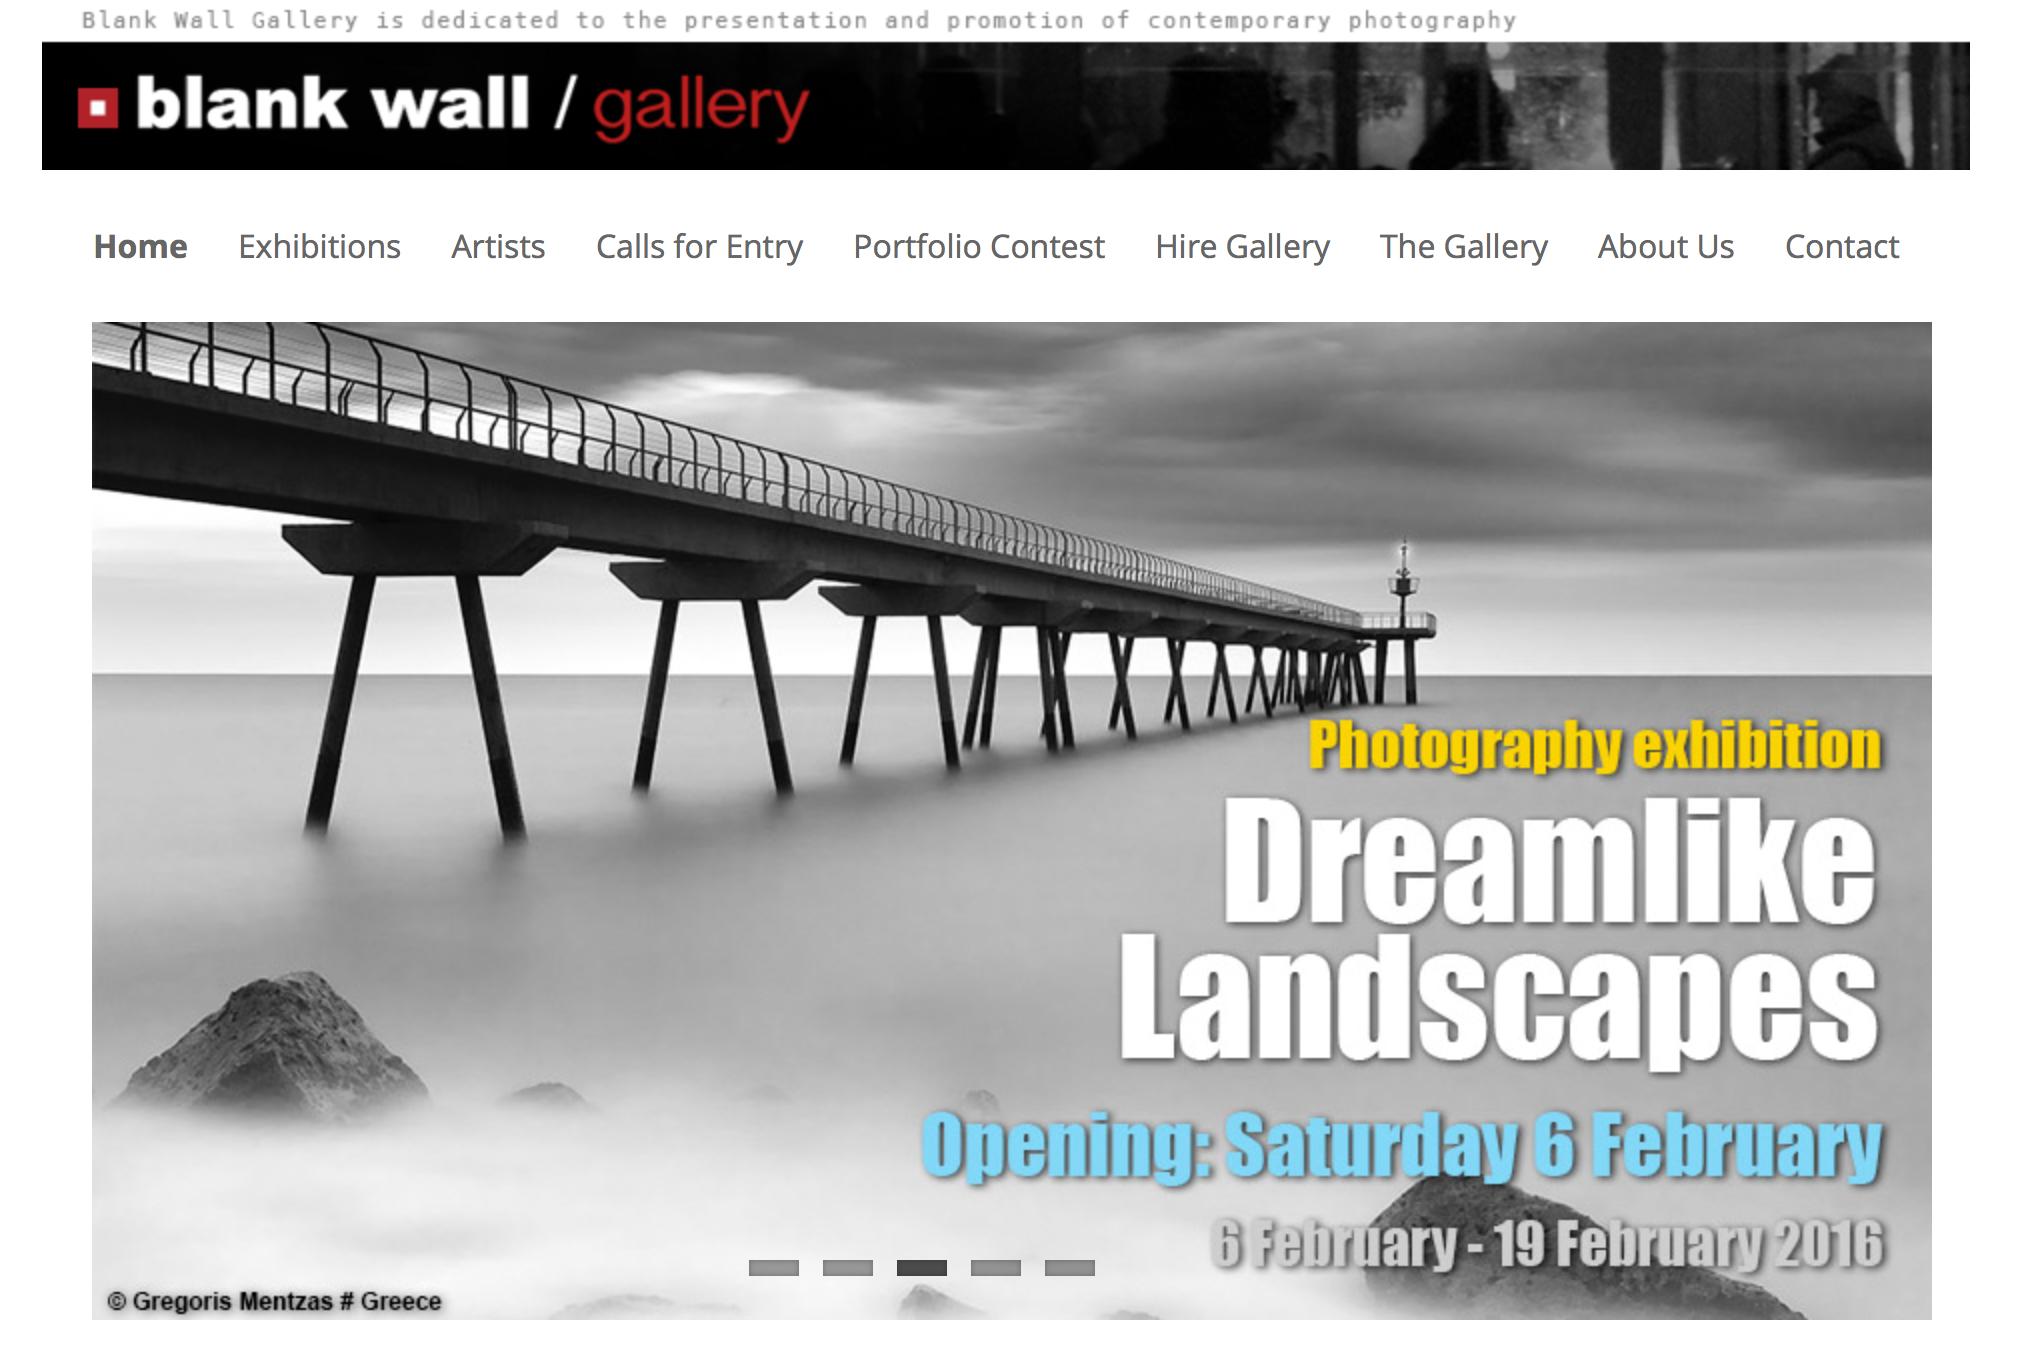 blankwall-gallery.png